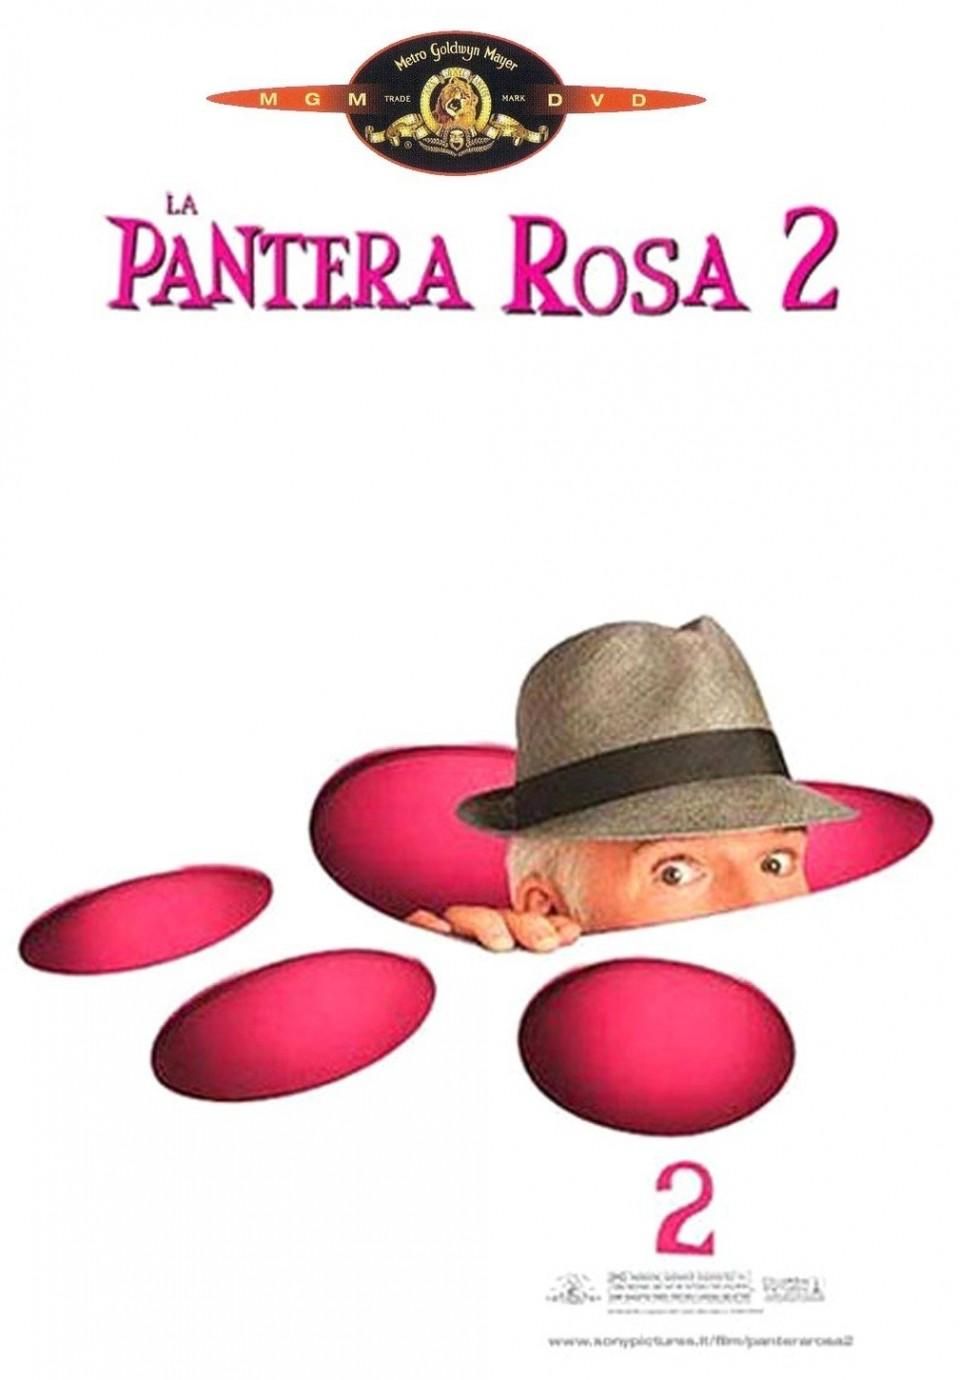 La Pantera Rosa 2